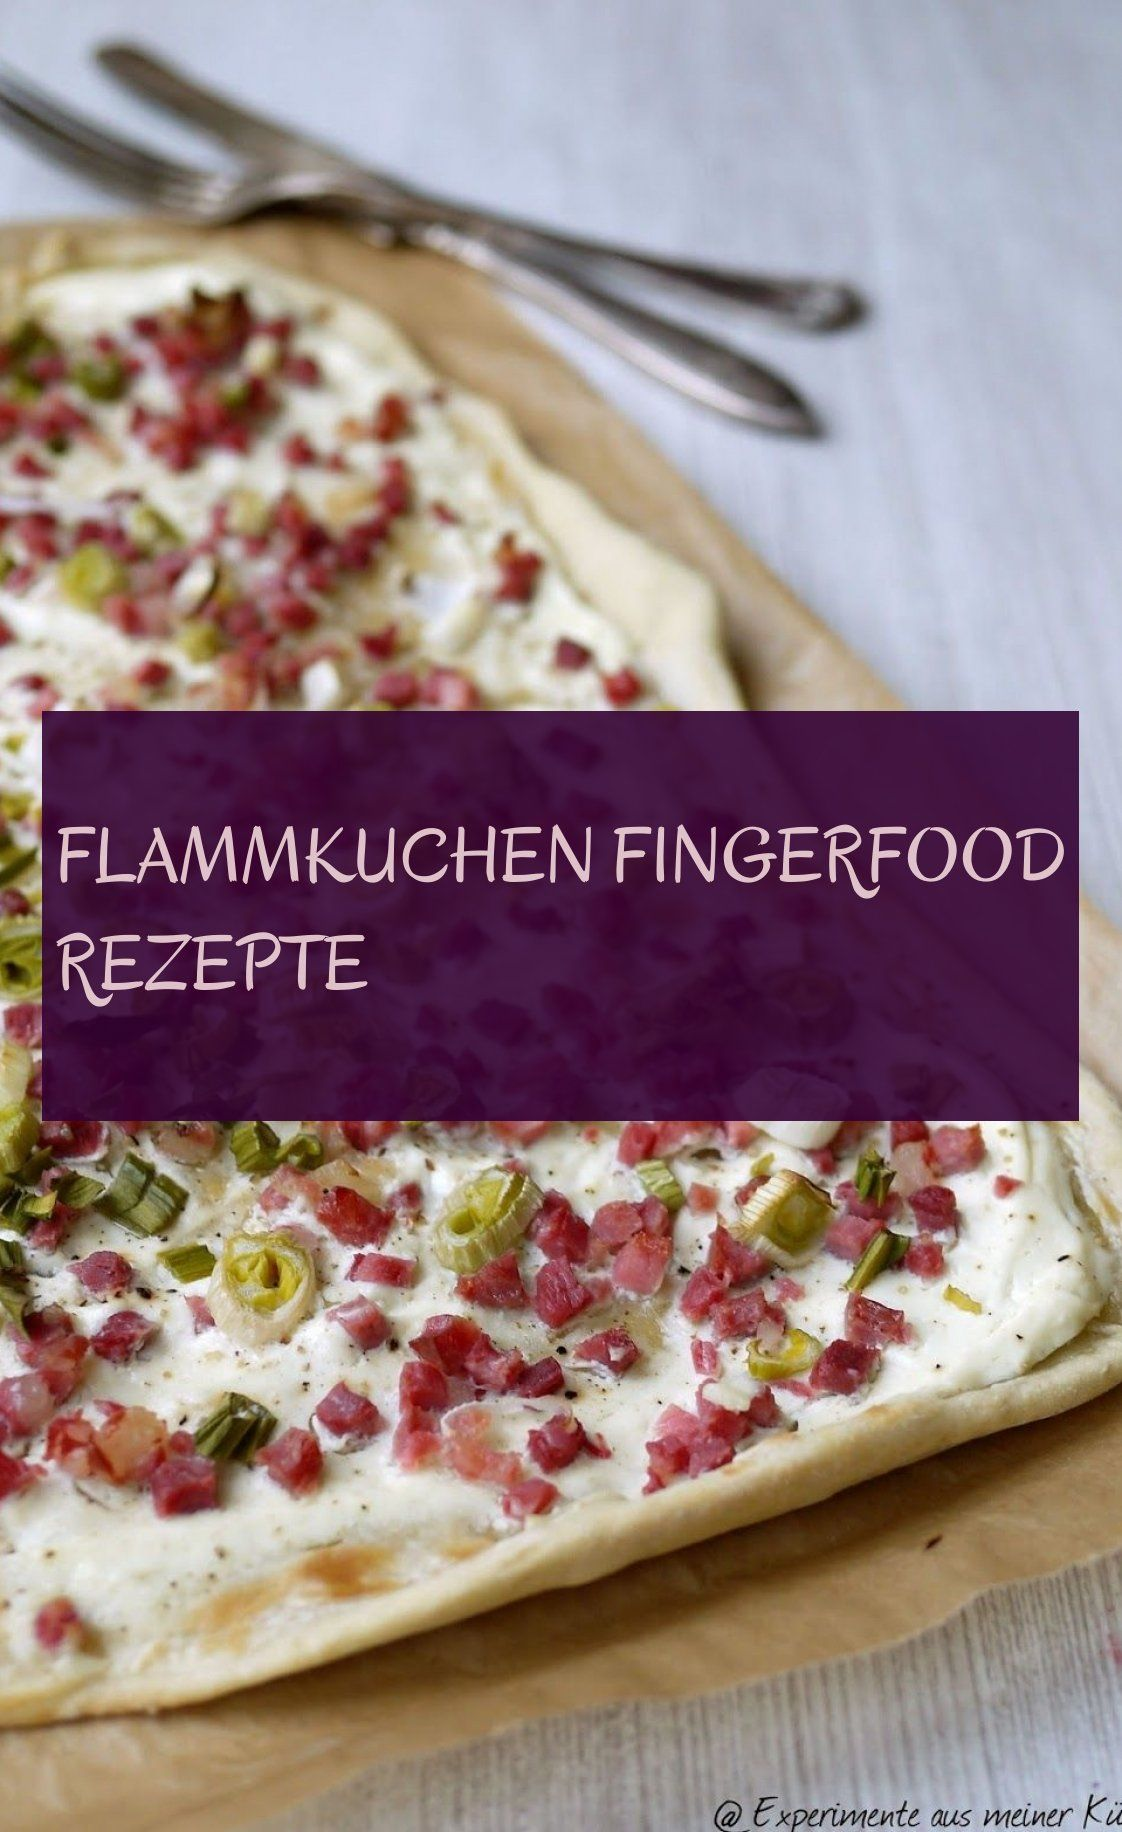 flammkuchen fingerfood rezepte * 09.20.2019